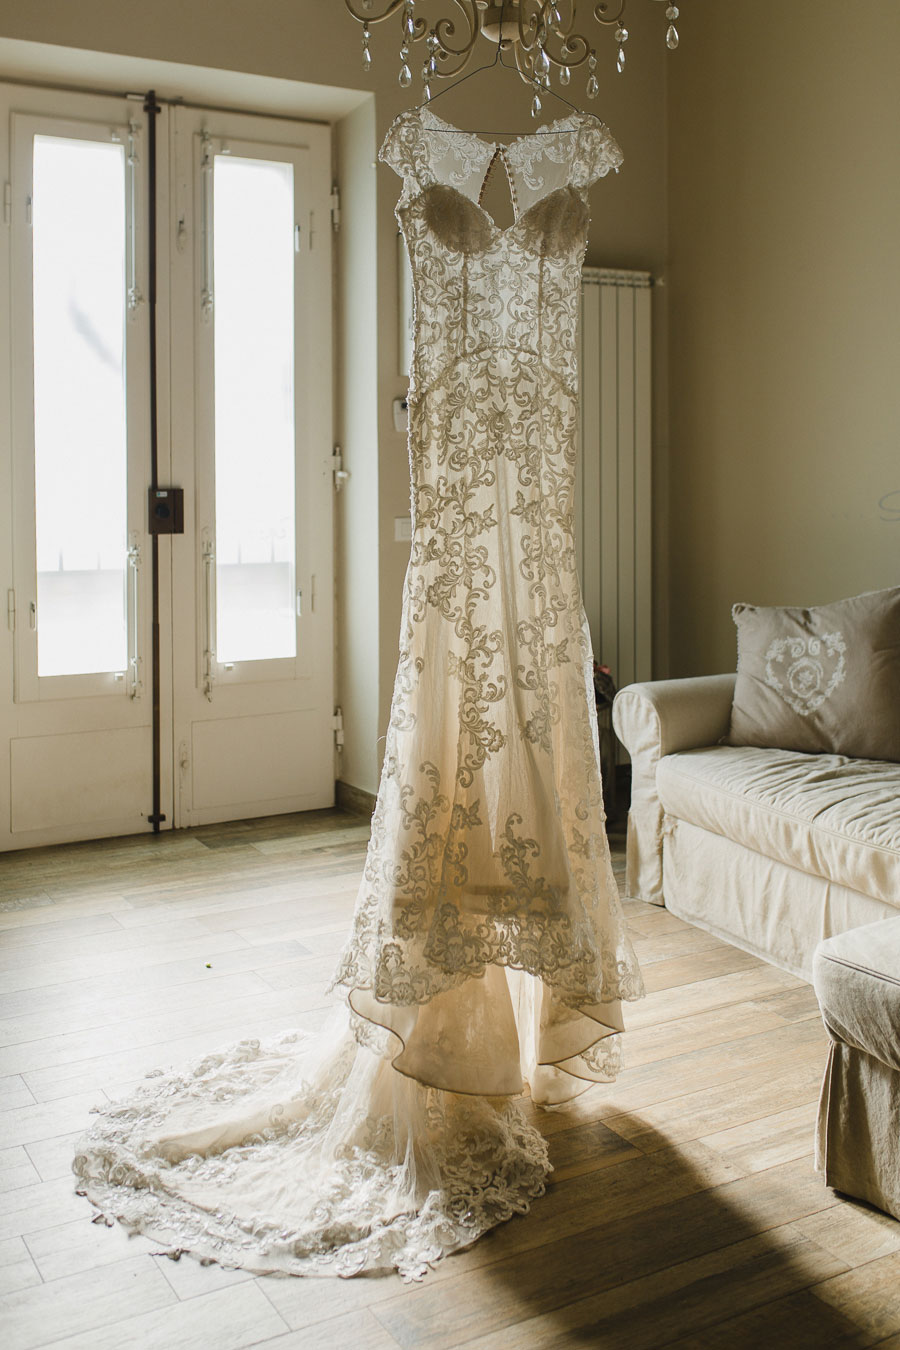 Wedding-Nicholad-and-Federica-Giuseppe-Giovannelli-251